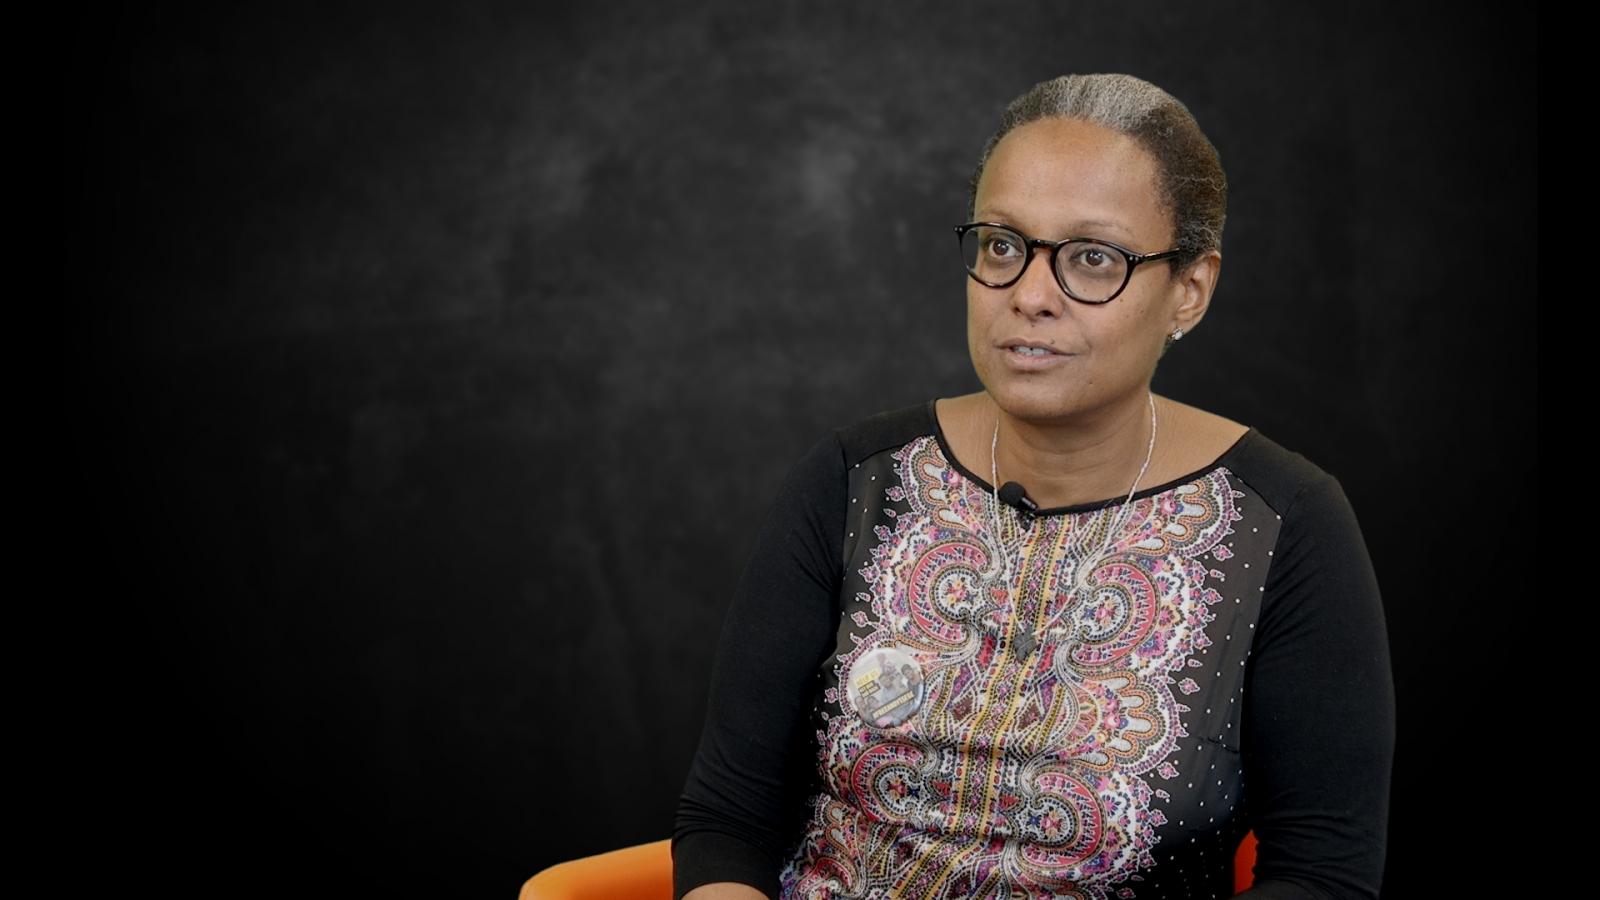 Interview with Yemi Hailemariam